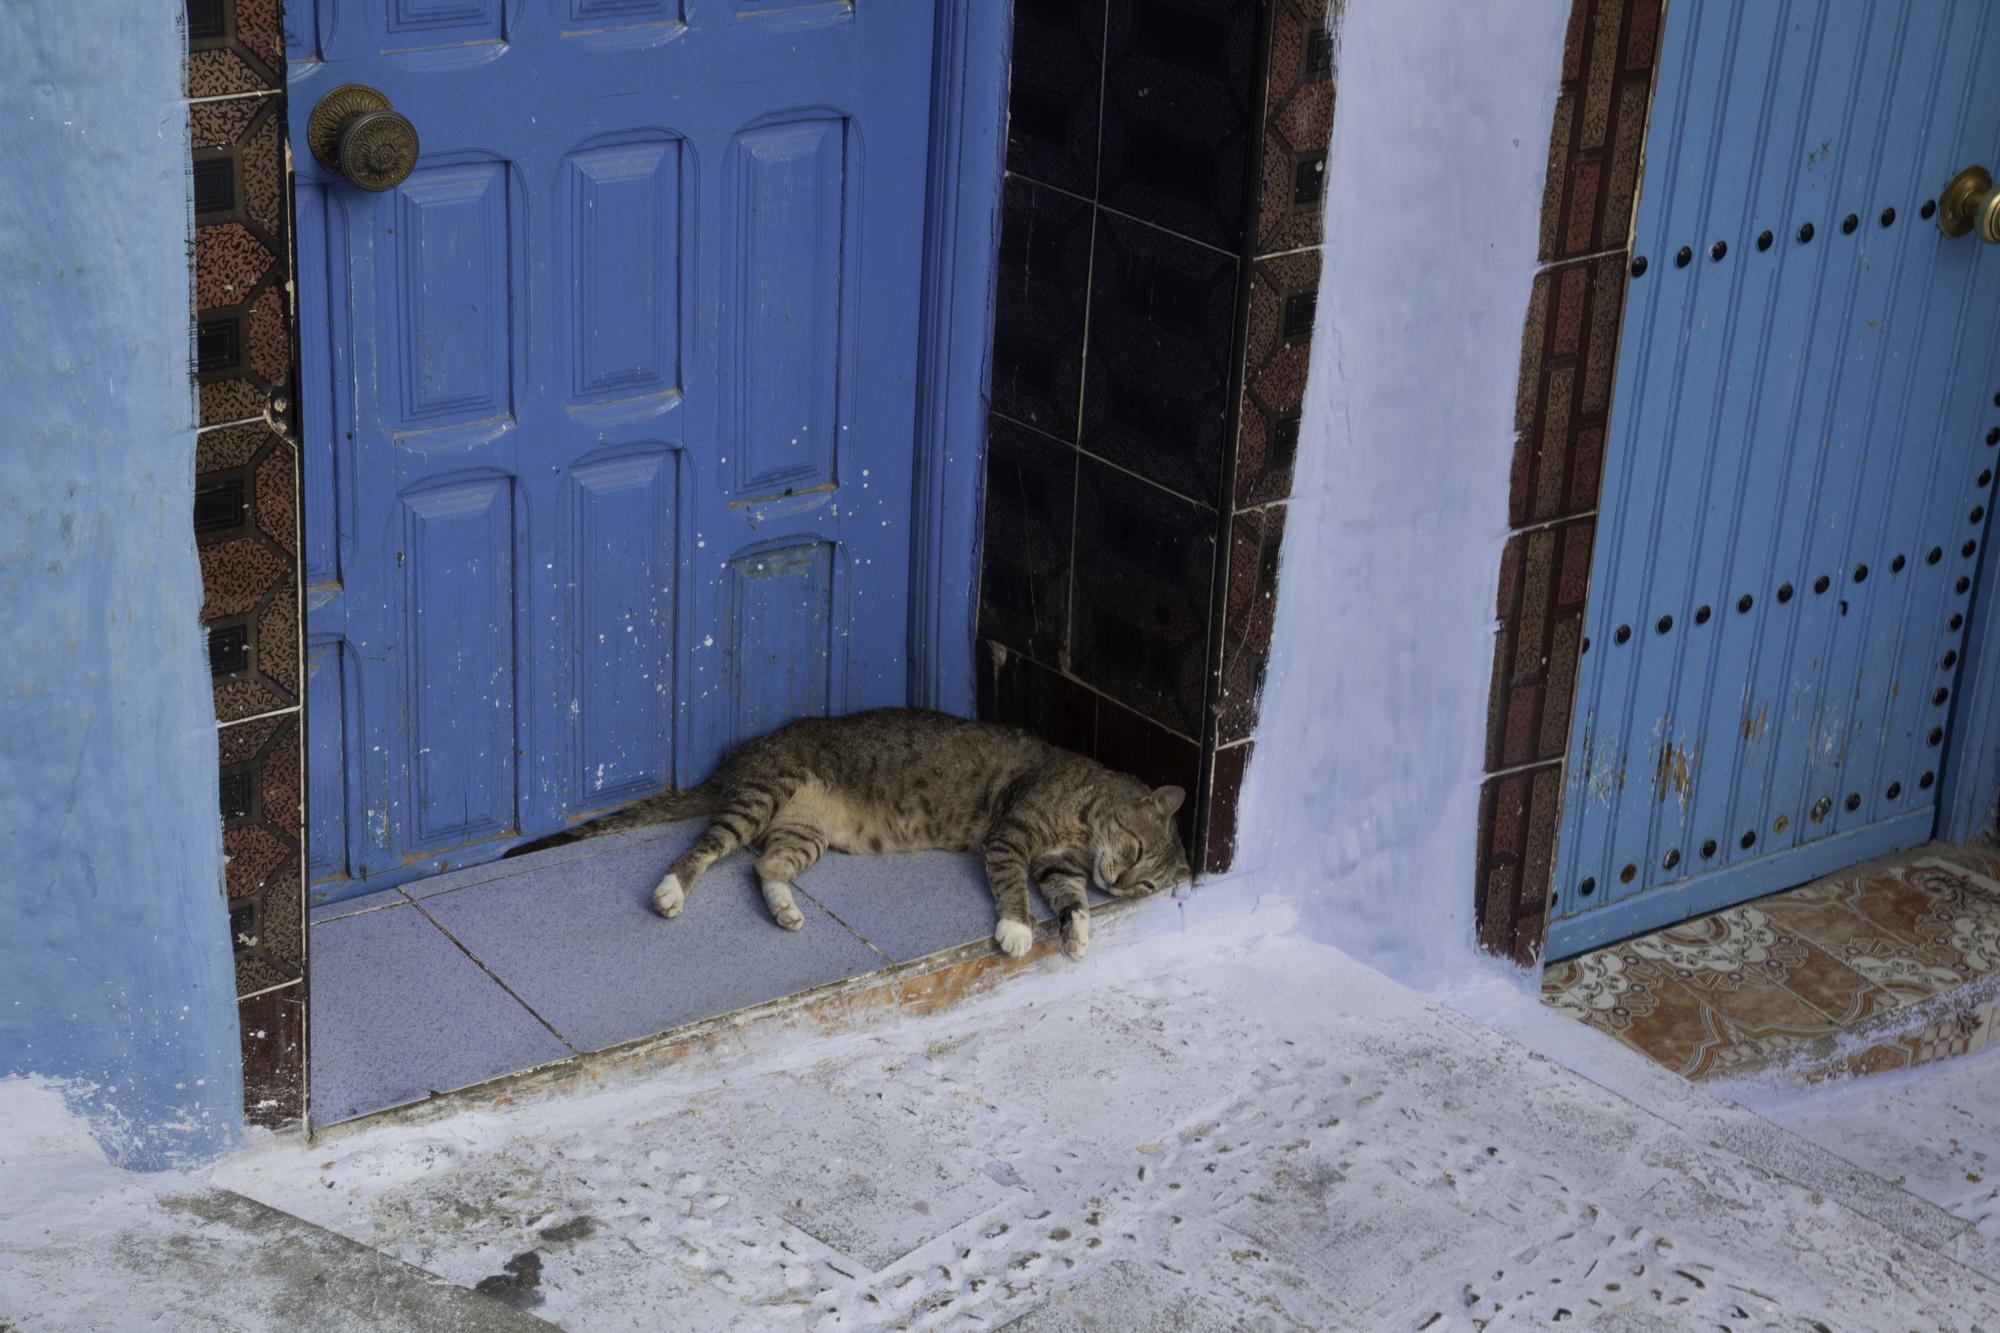 Morocco-2-39.jpg